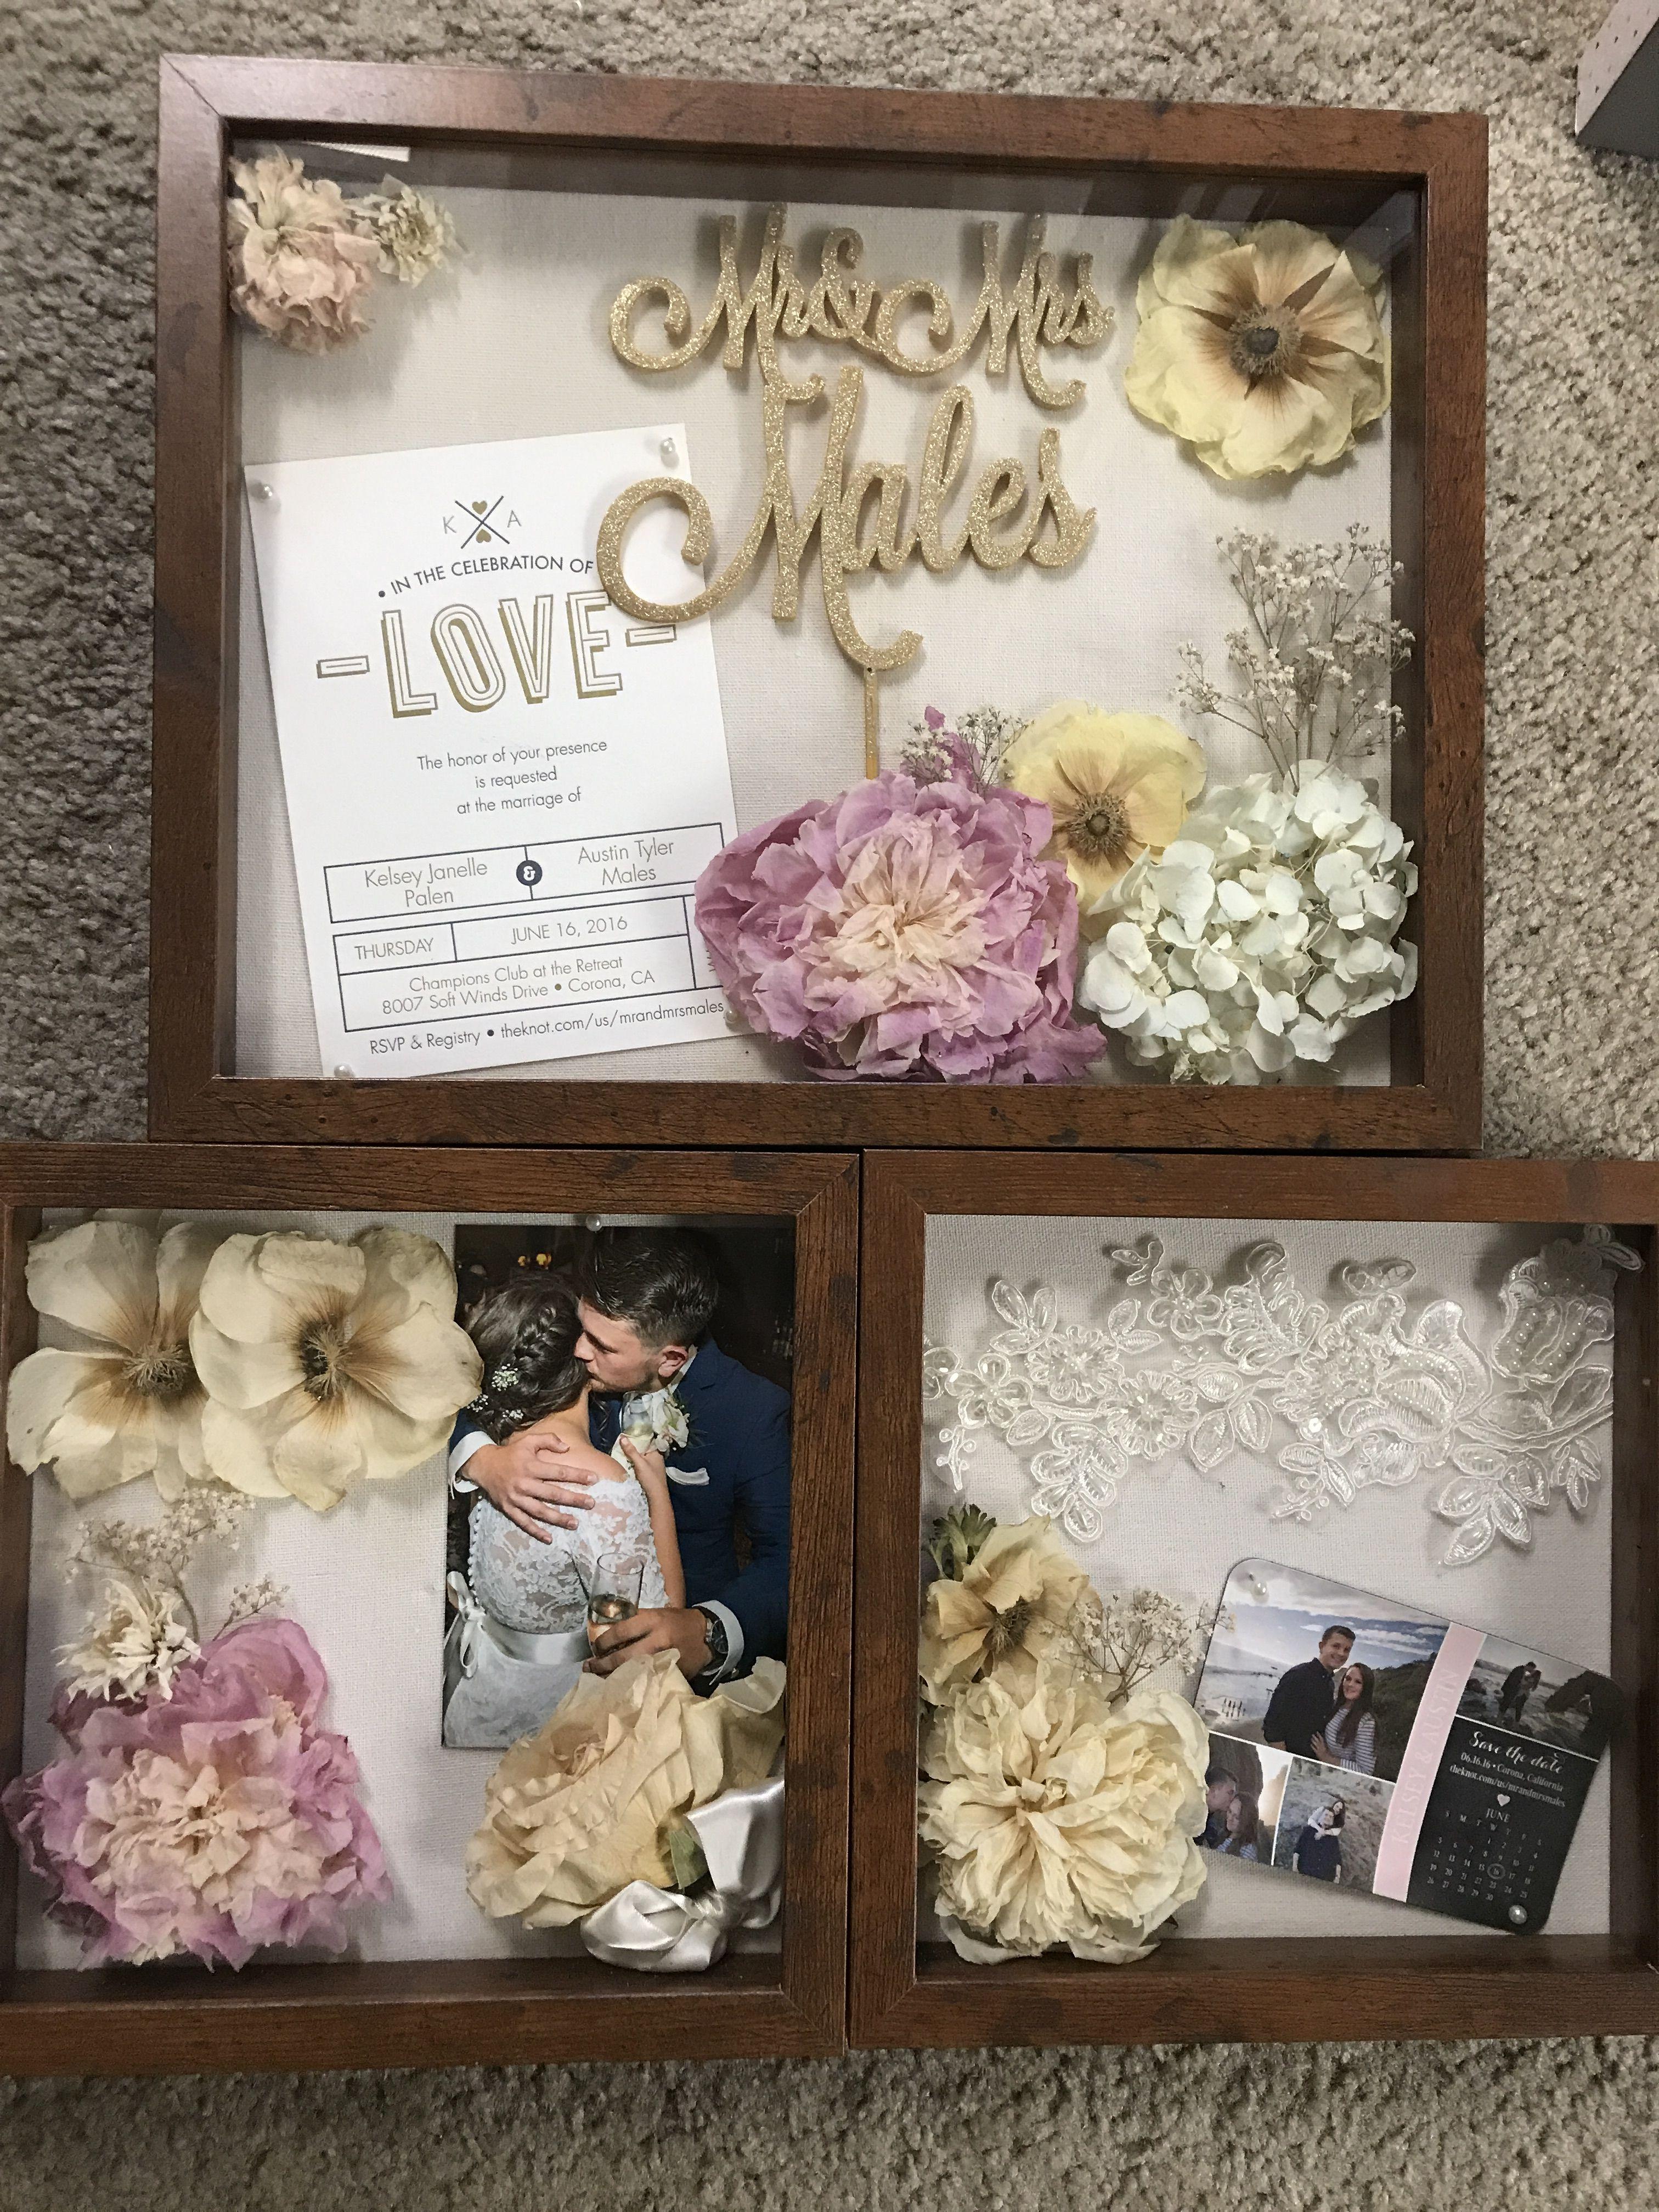 Wedding shadow box! Flowers from bouquet, invitation, cake ...